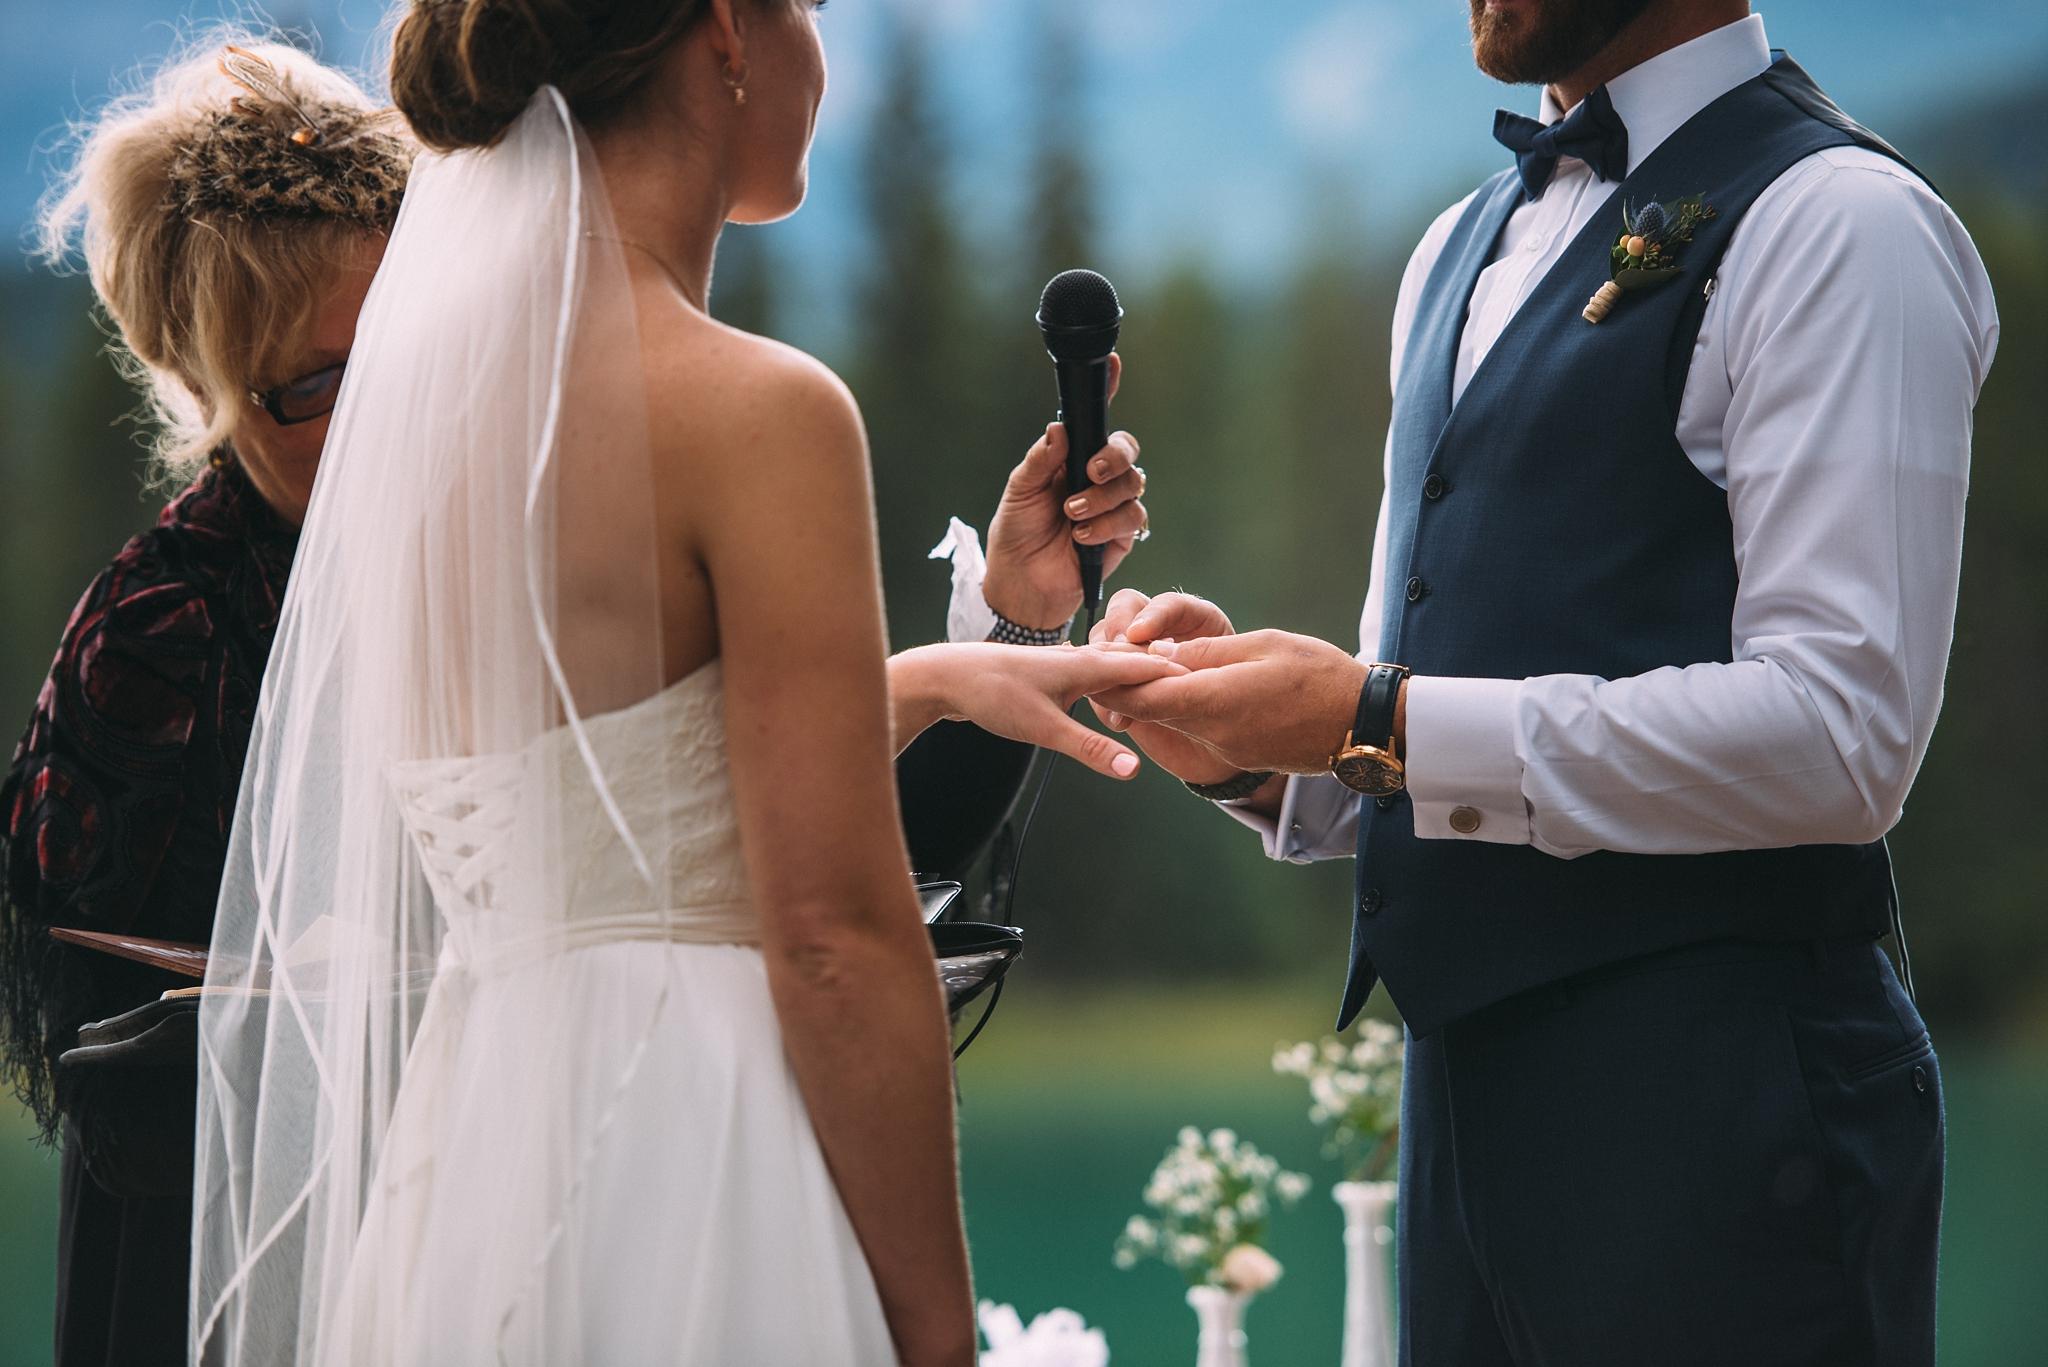 kaihla_tonai_intimate_wedding_elopement_photographer_2526